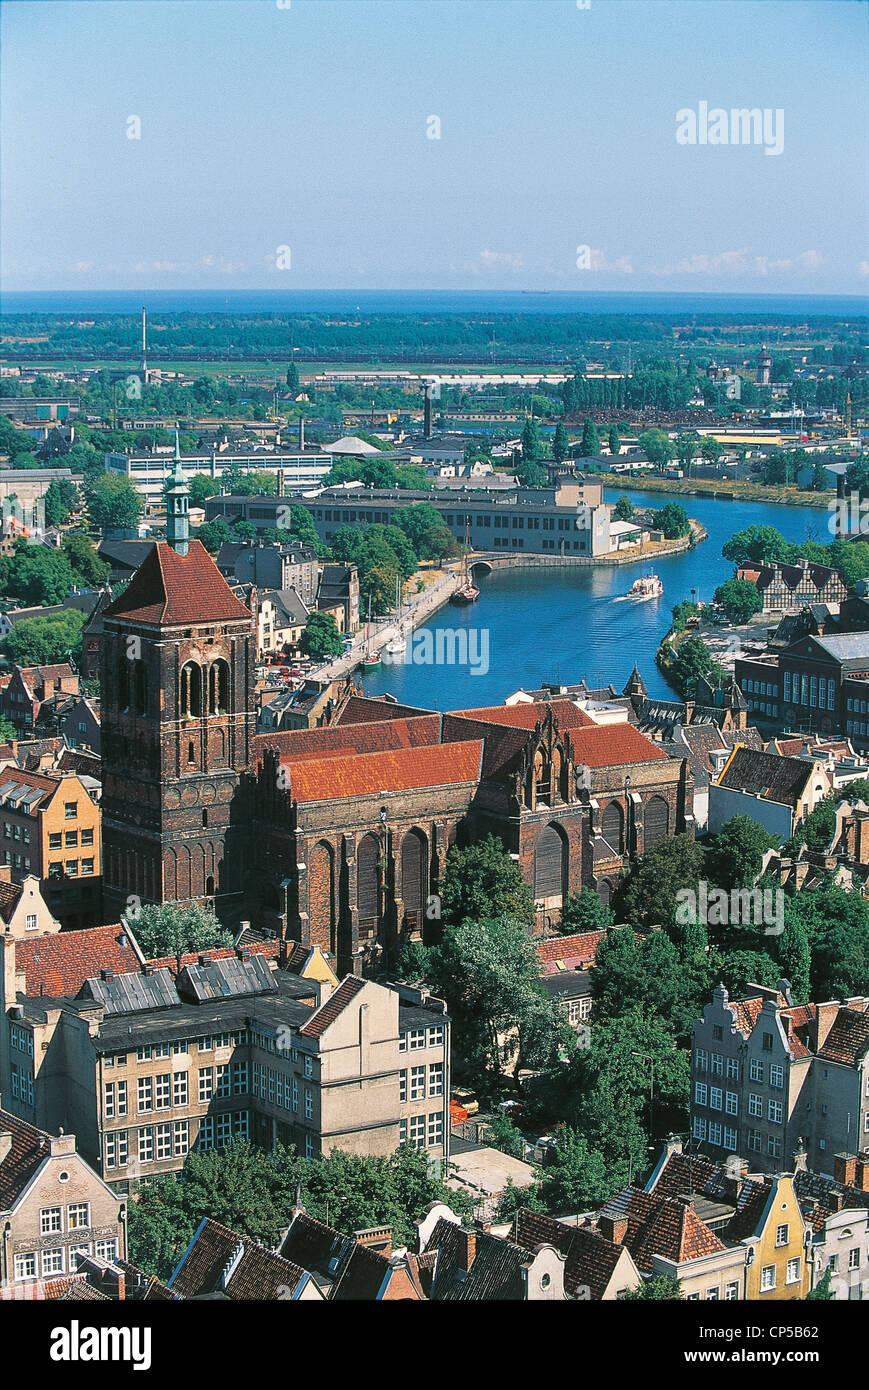 POLAND, Pomerania. GDANSK, THE CATHEDRAL - Stock Image